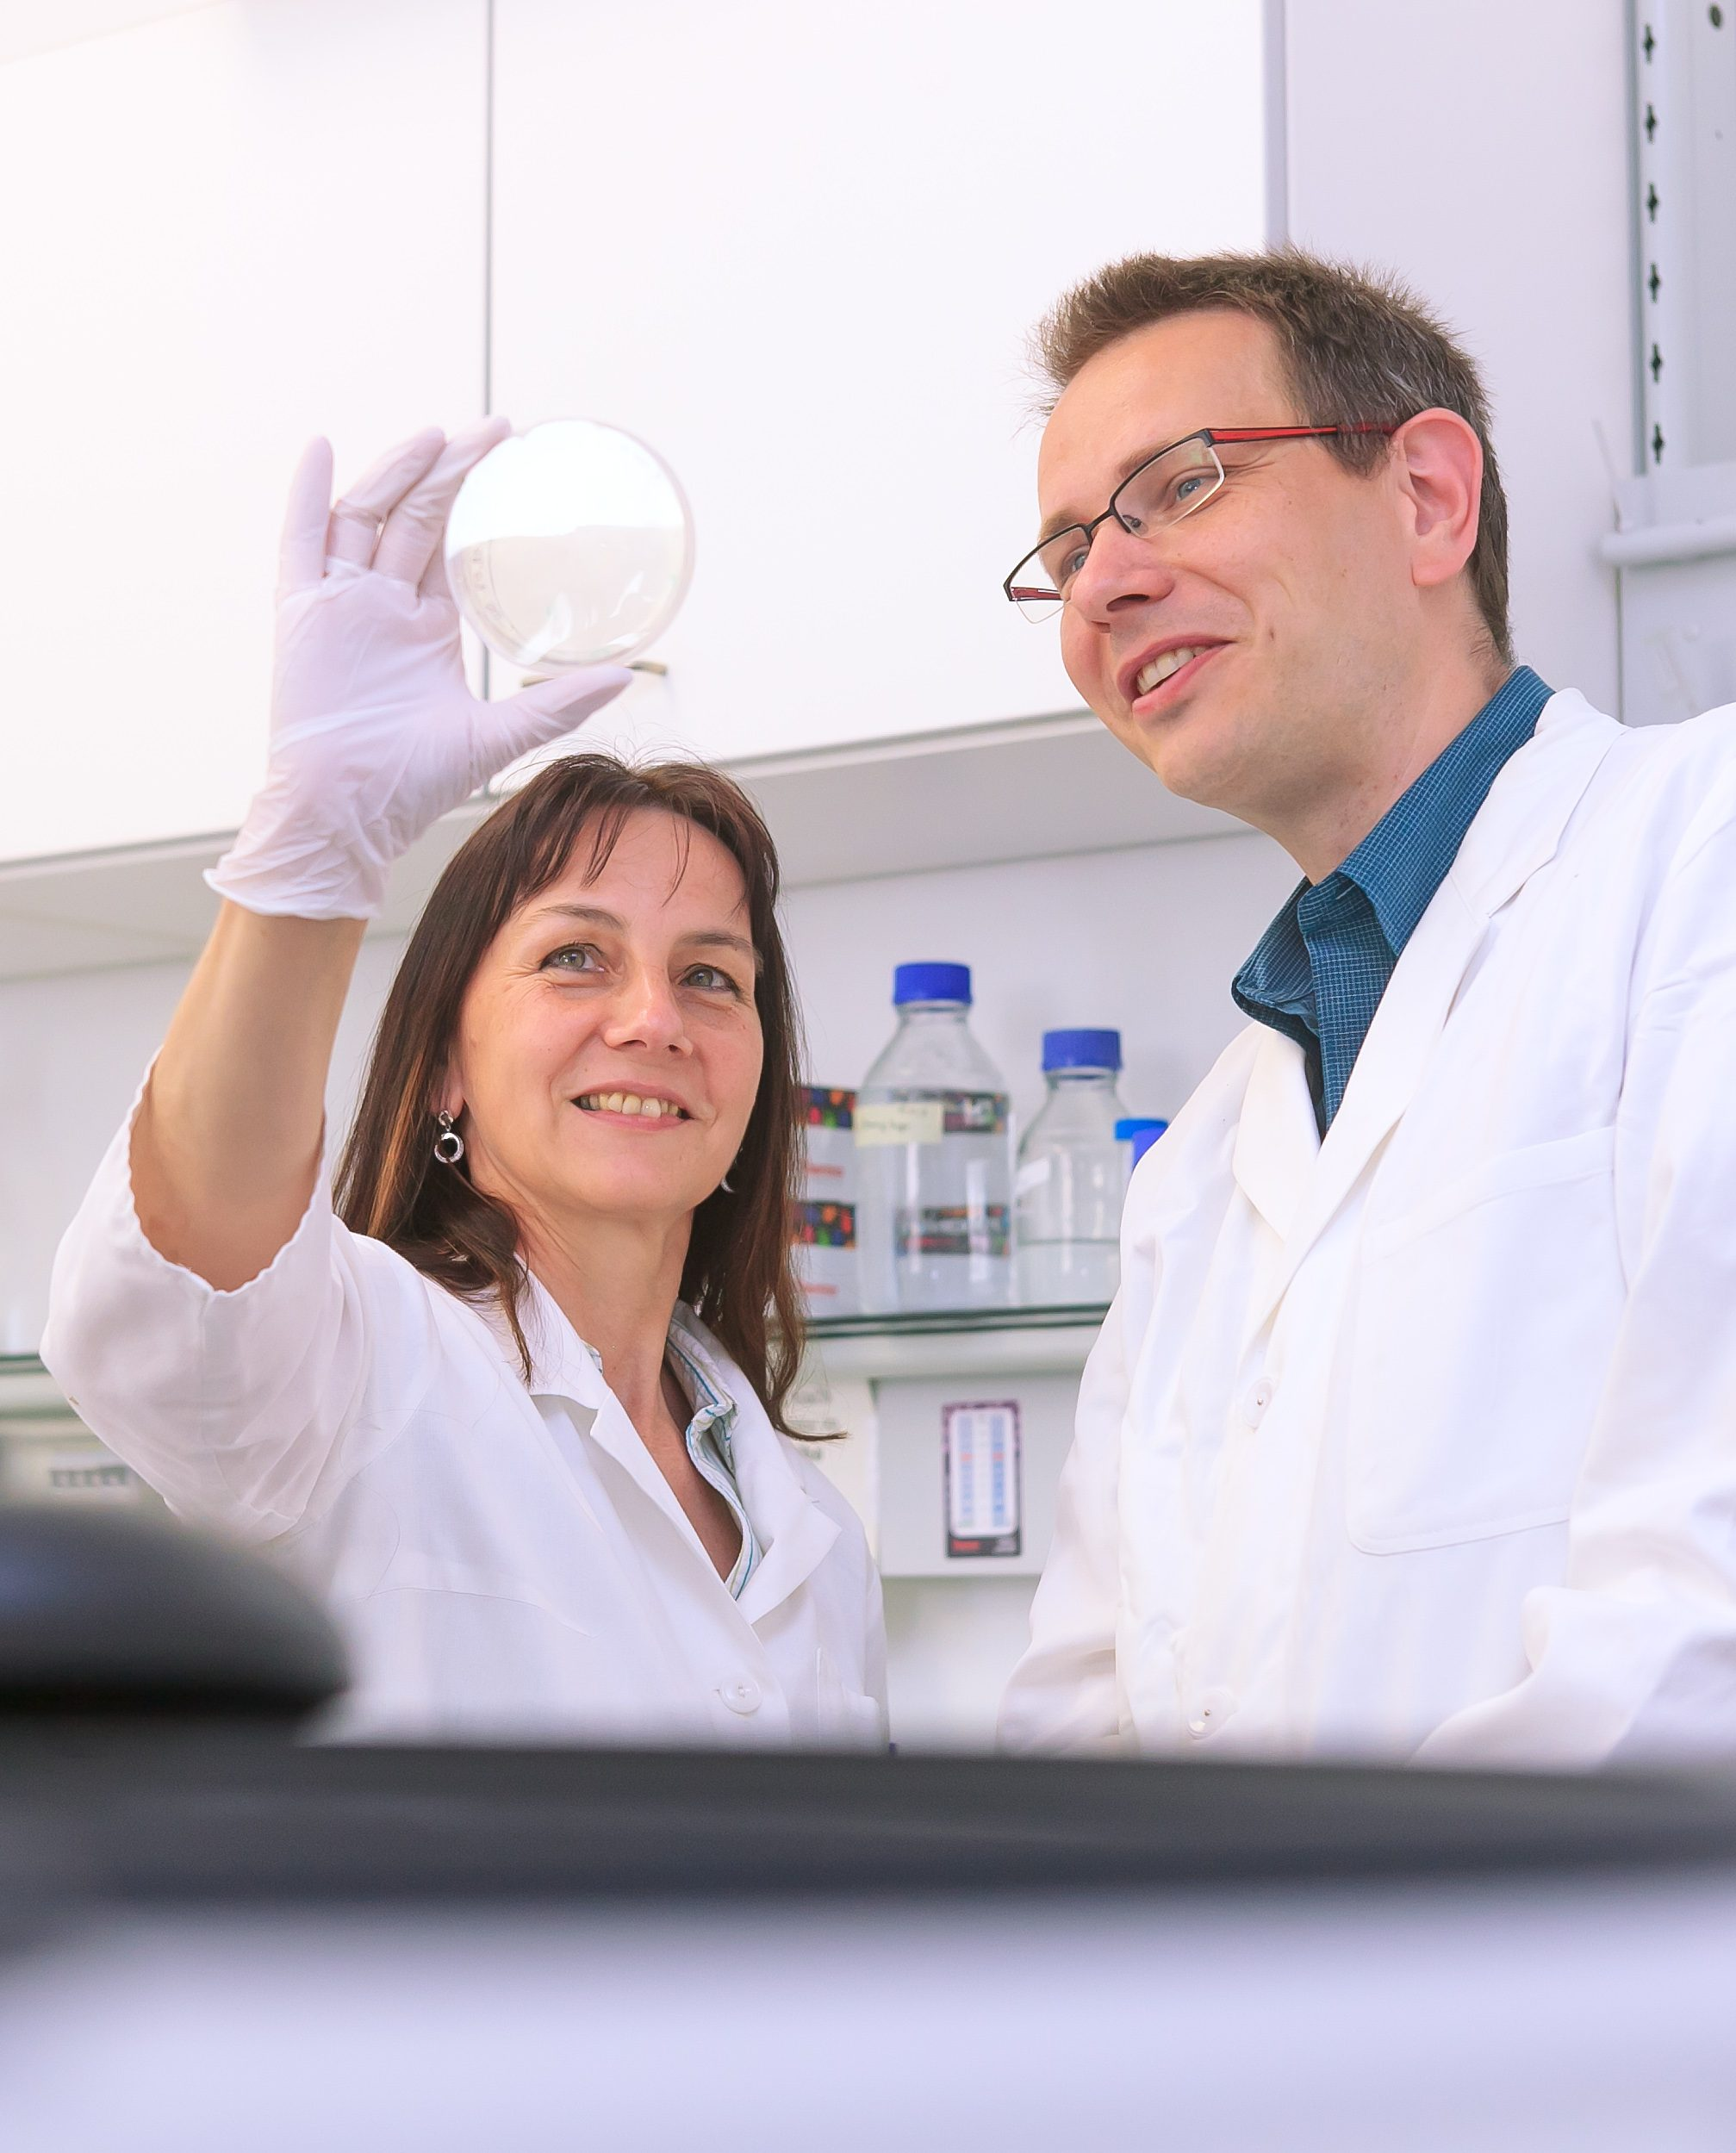 Professor Jens Meiler received Friedrich Wilhelm Bessel Research Award